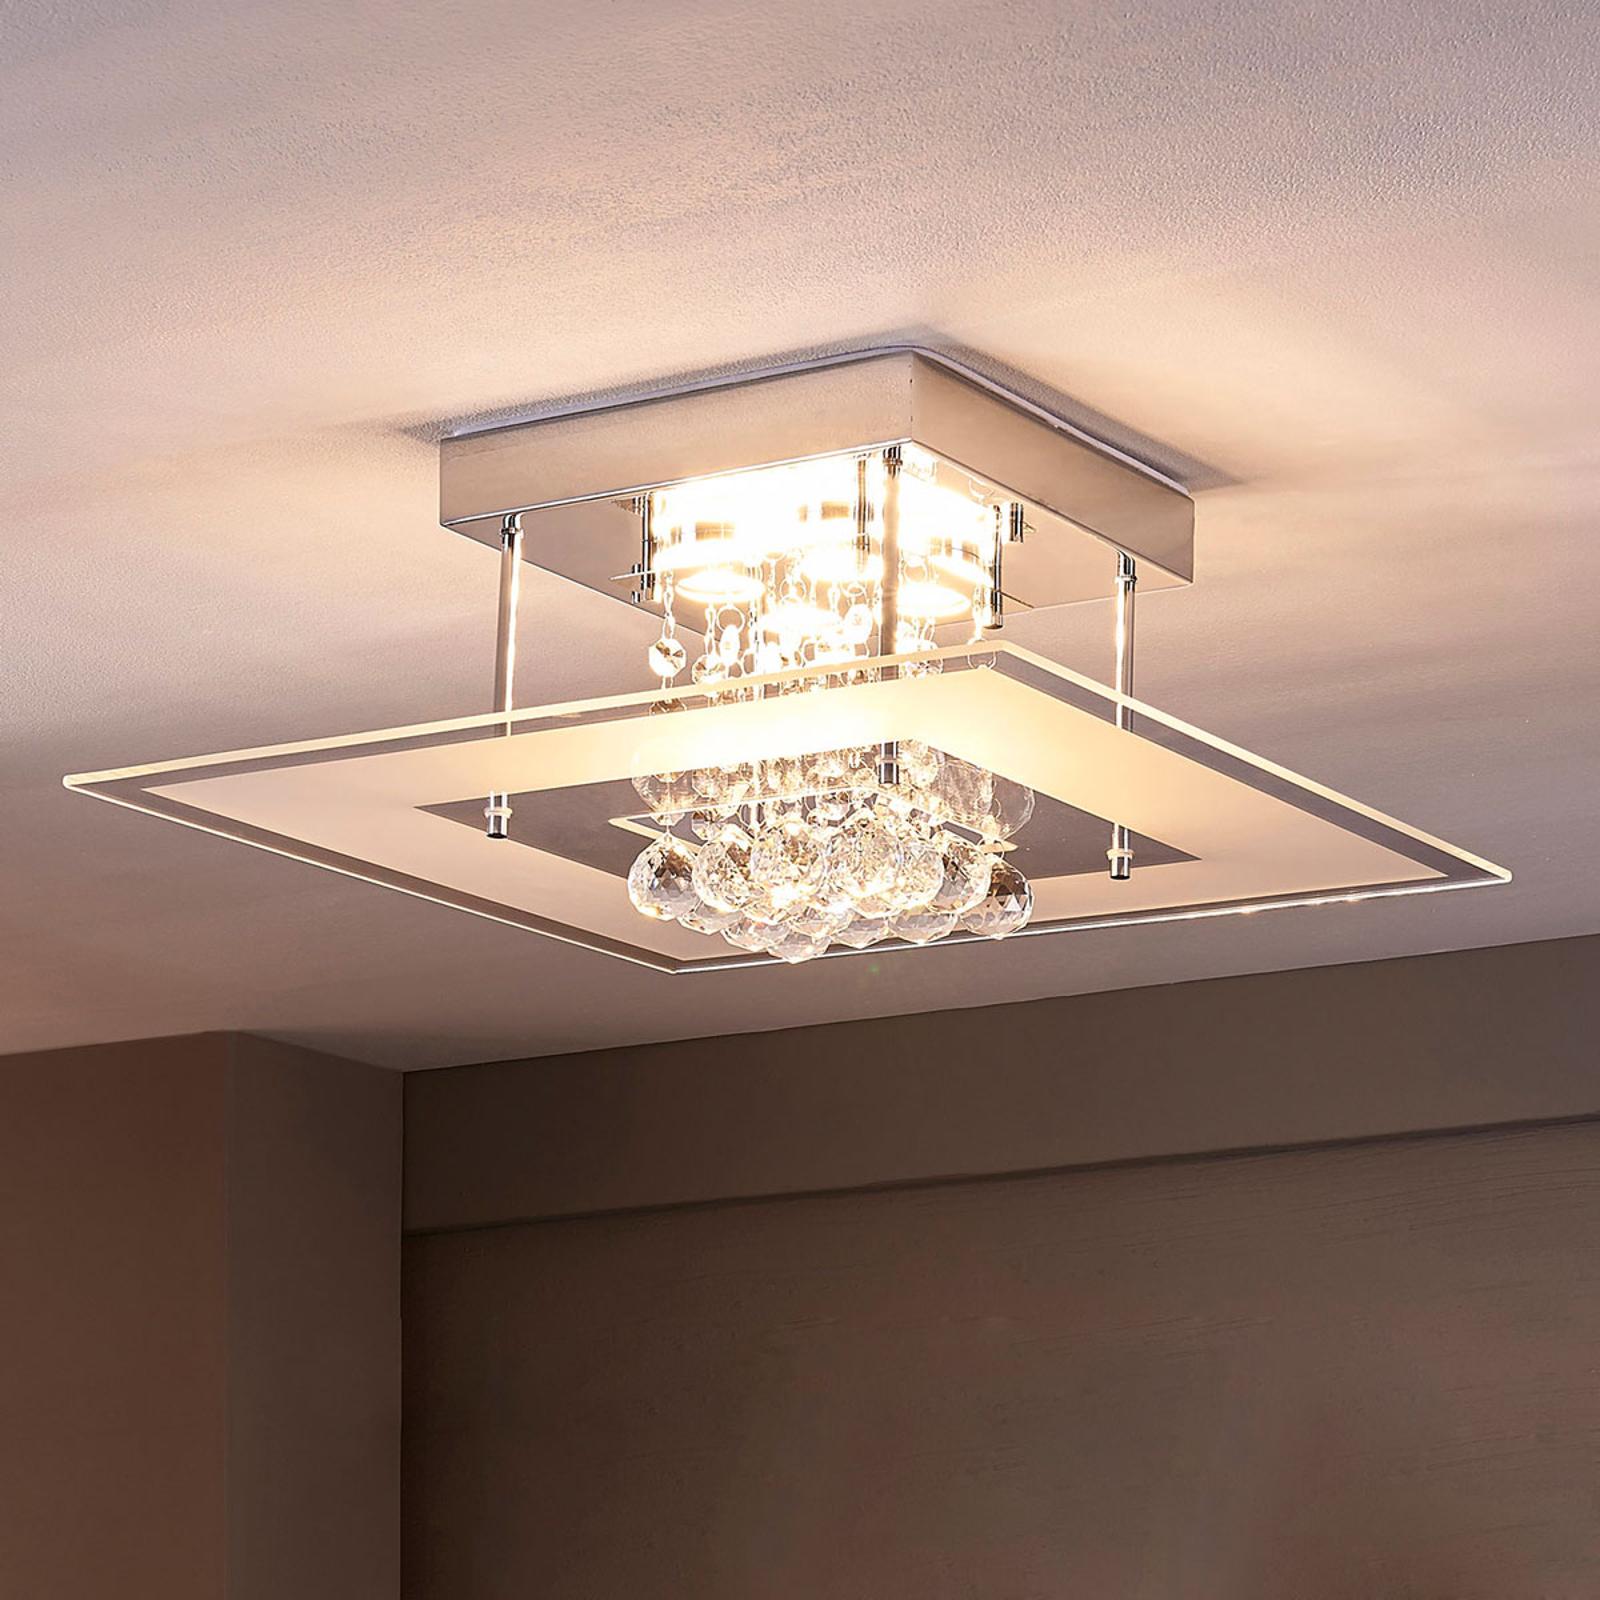 Original lámparaLED de techoLisandra para baño